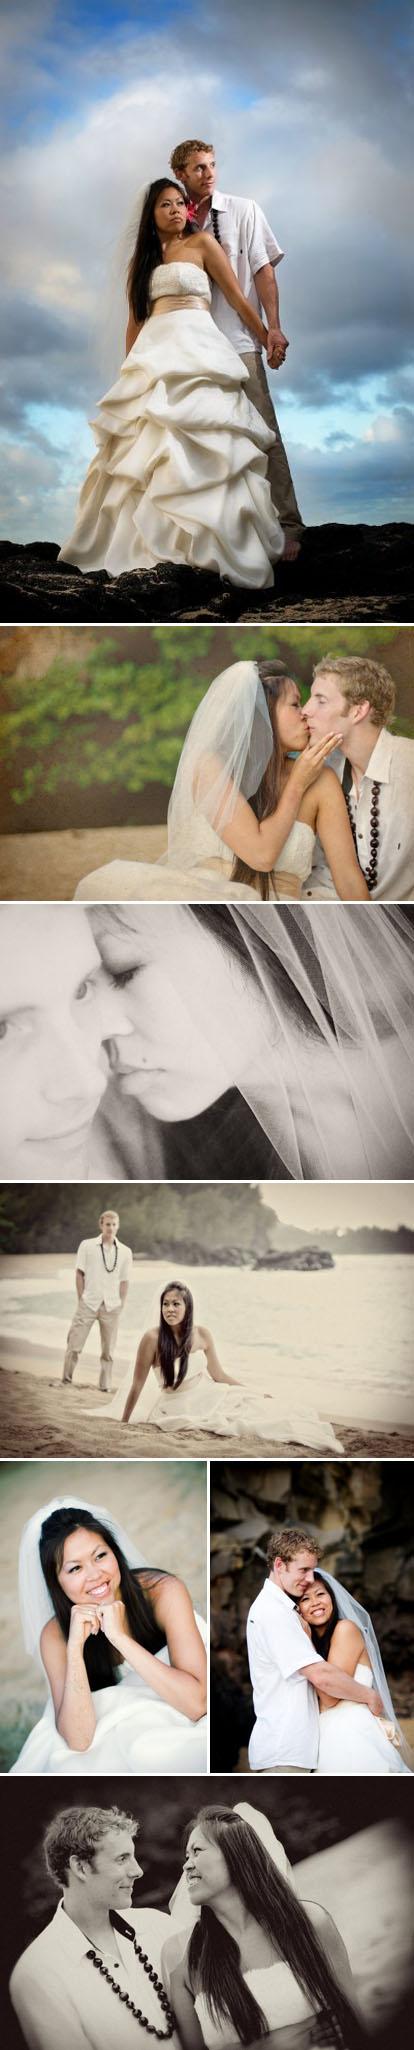 Kauai honeymoon photos by Jennifer Pratner of Island Echoes Photography